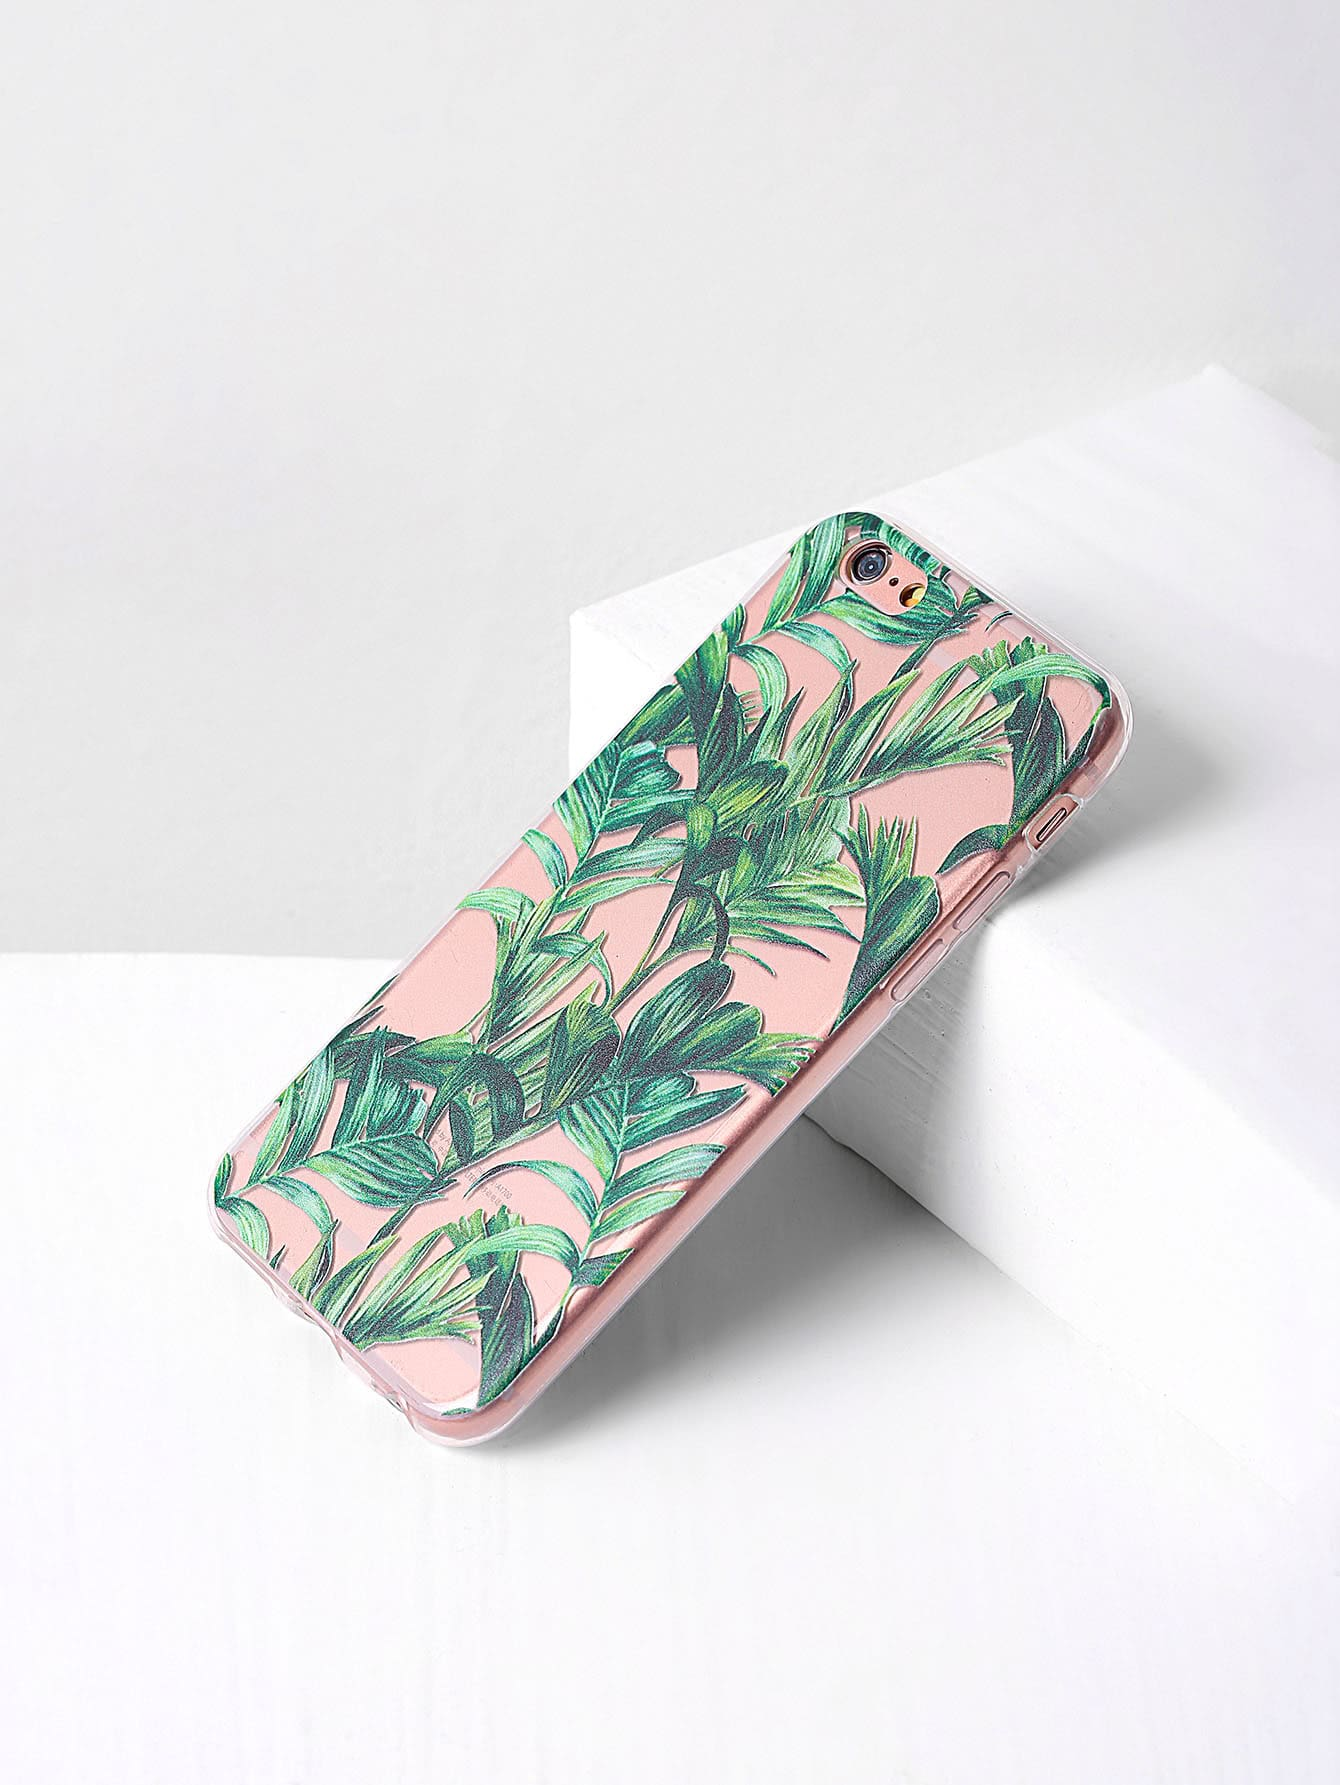 Green Leaf Print Clear iPhone Case клавиатура mp 09a33su 5282